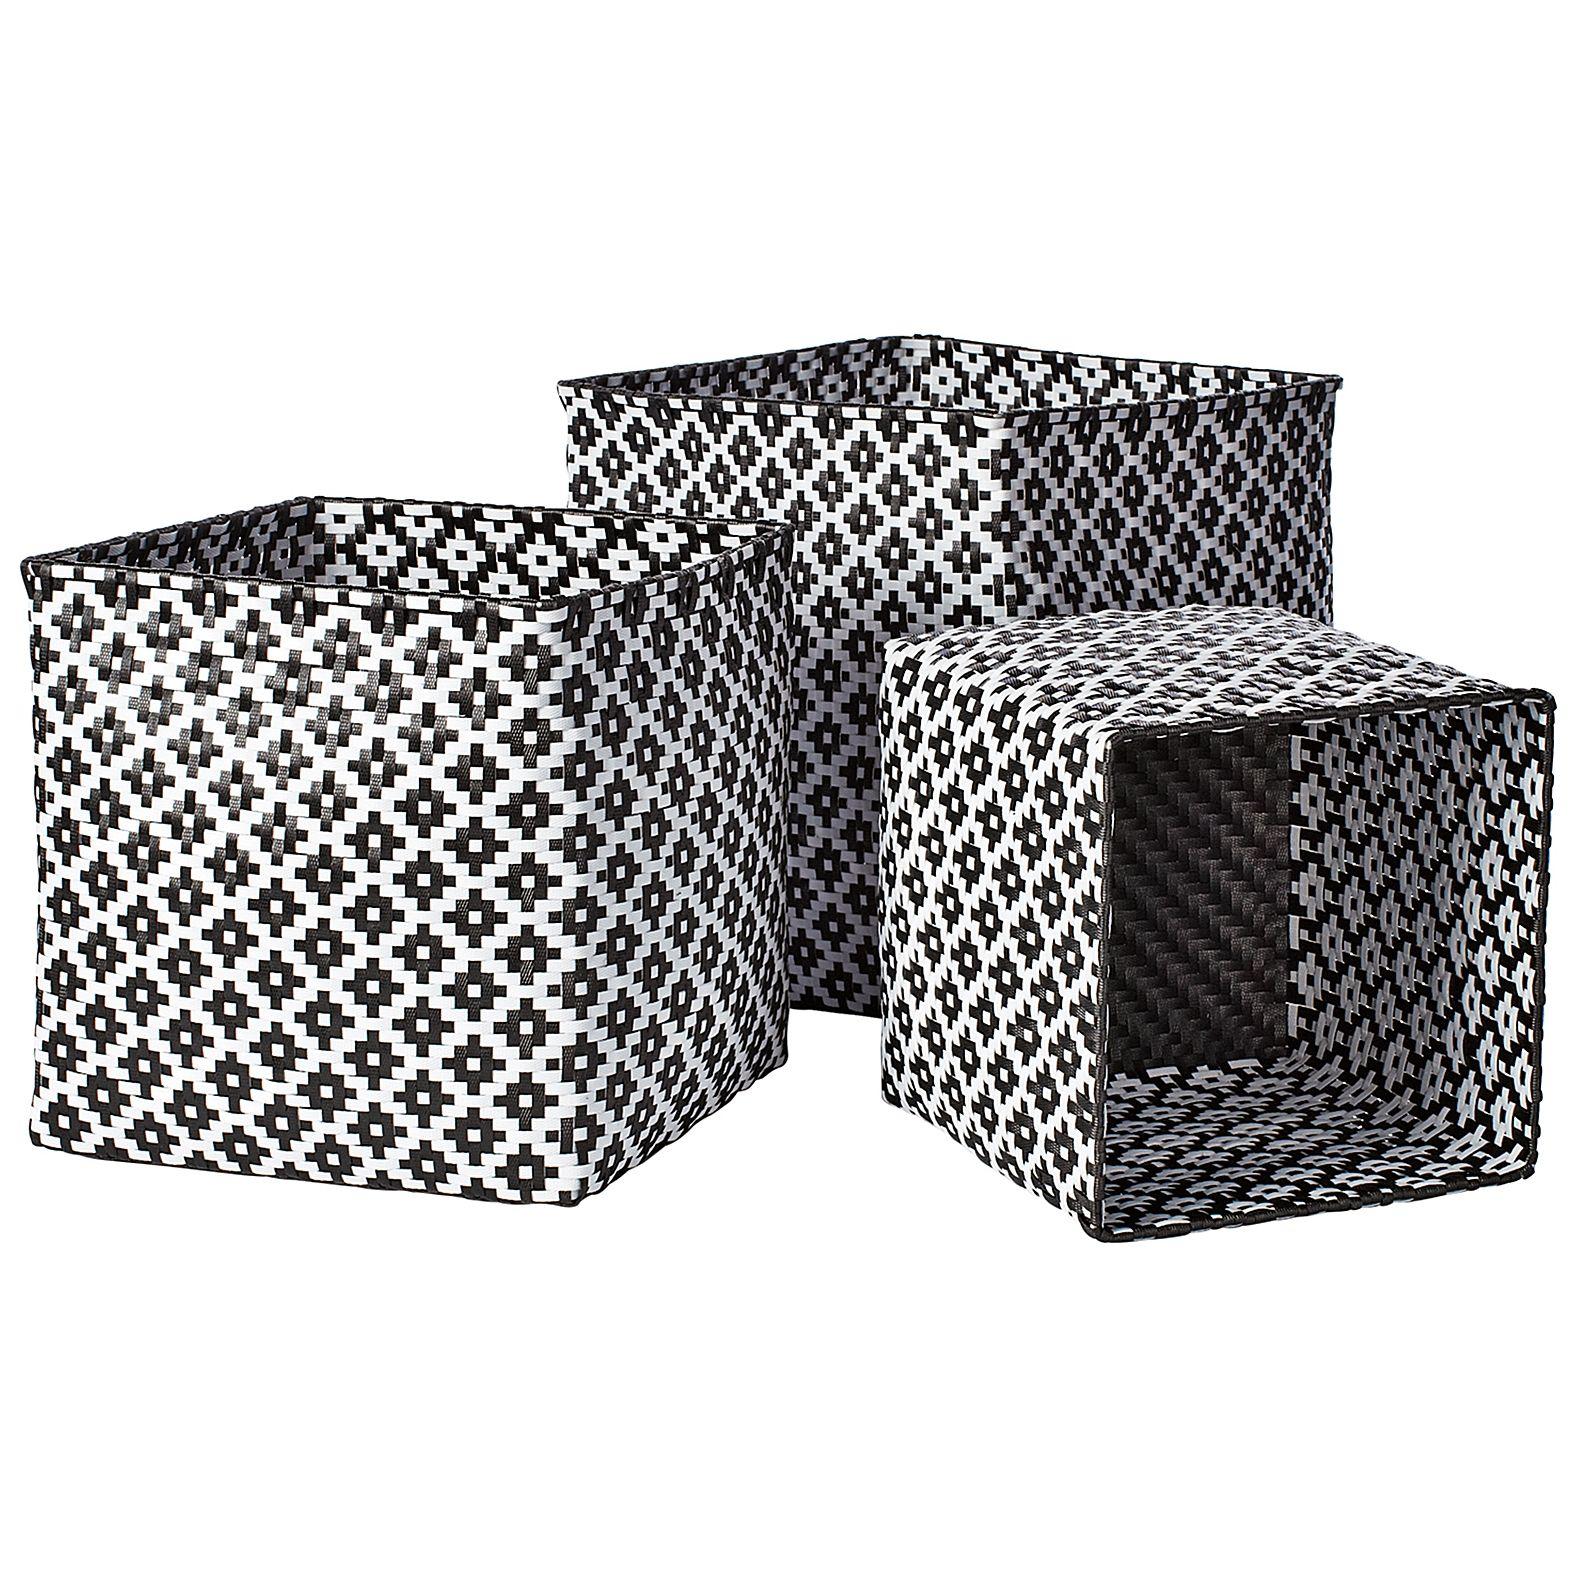 Black And White Storage Bins Bins Woven Baskets Storage